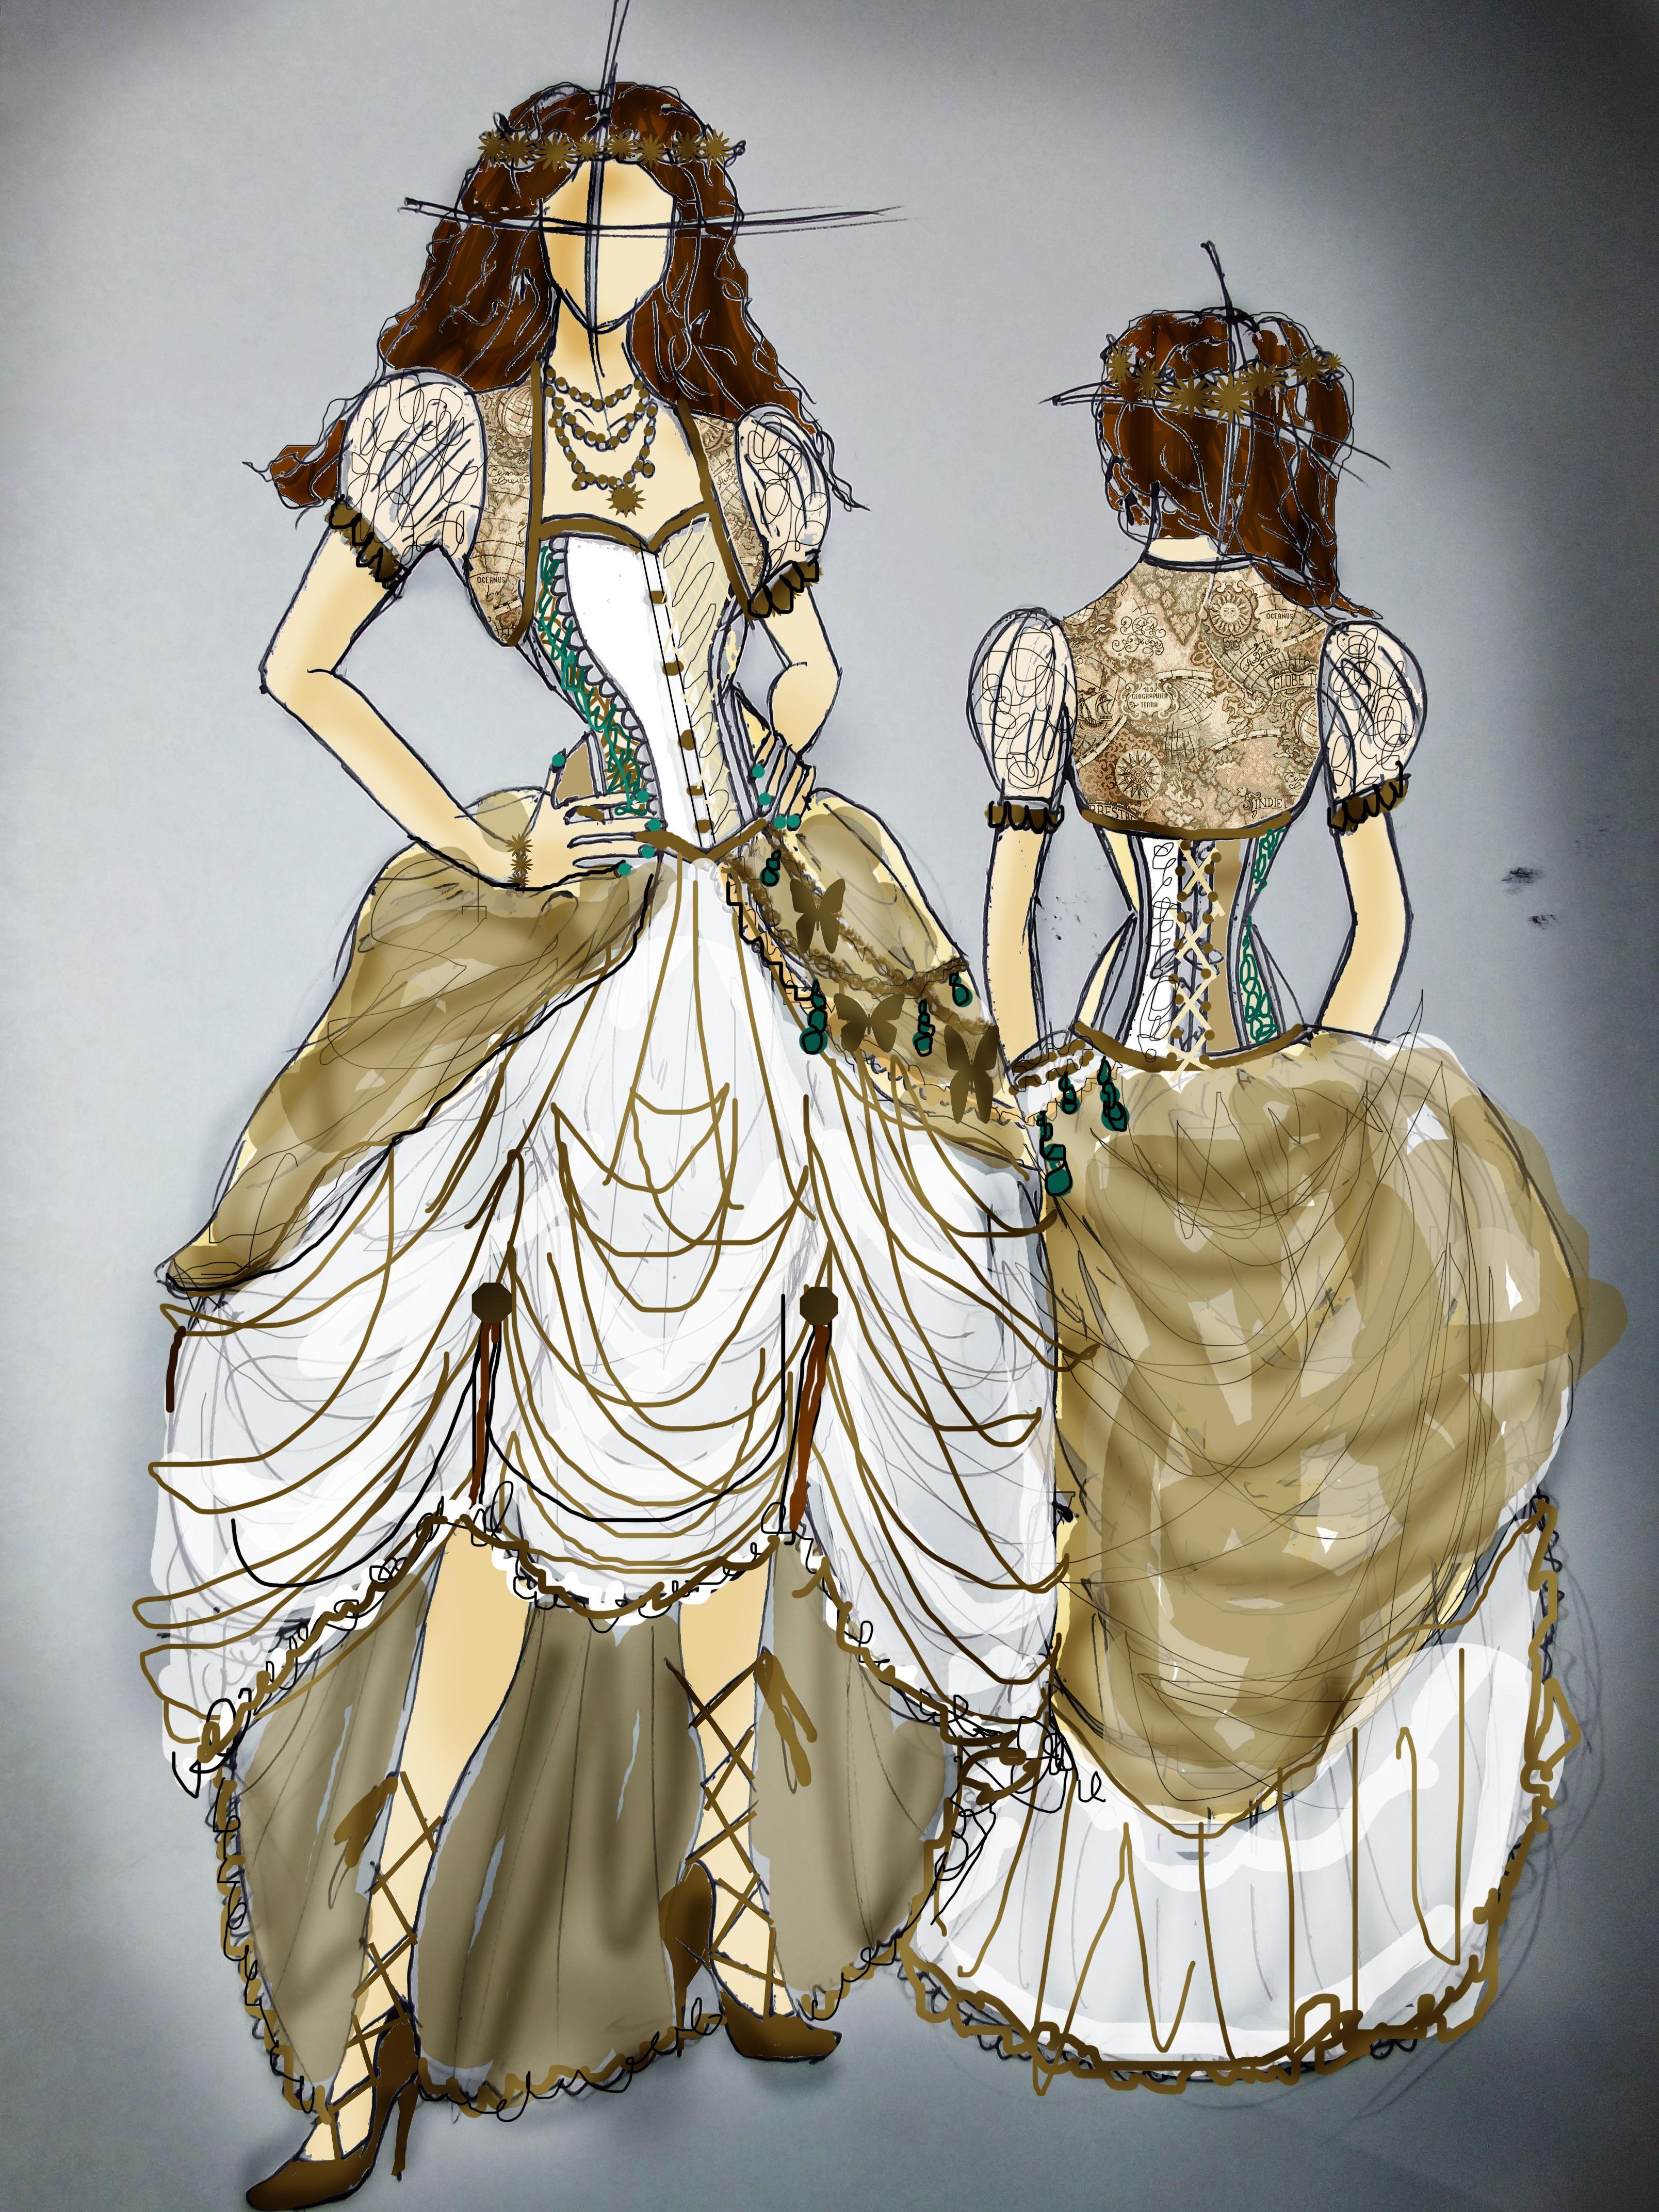 Steampunk wedding dresses  My wedding dress sketch Steampunk themed But practical and elegant